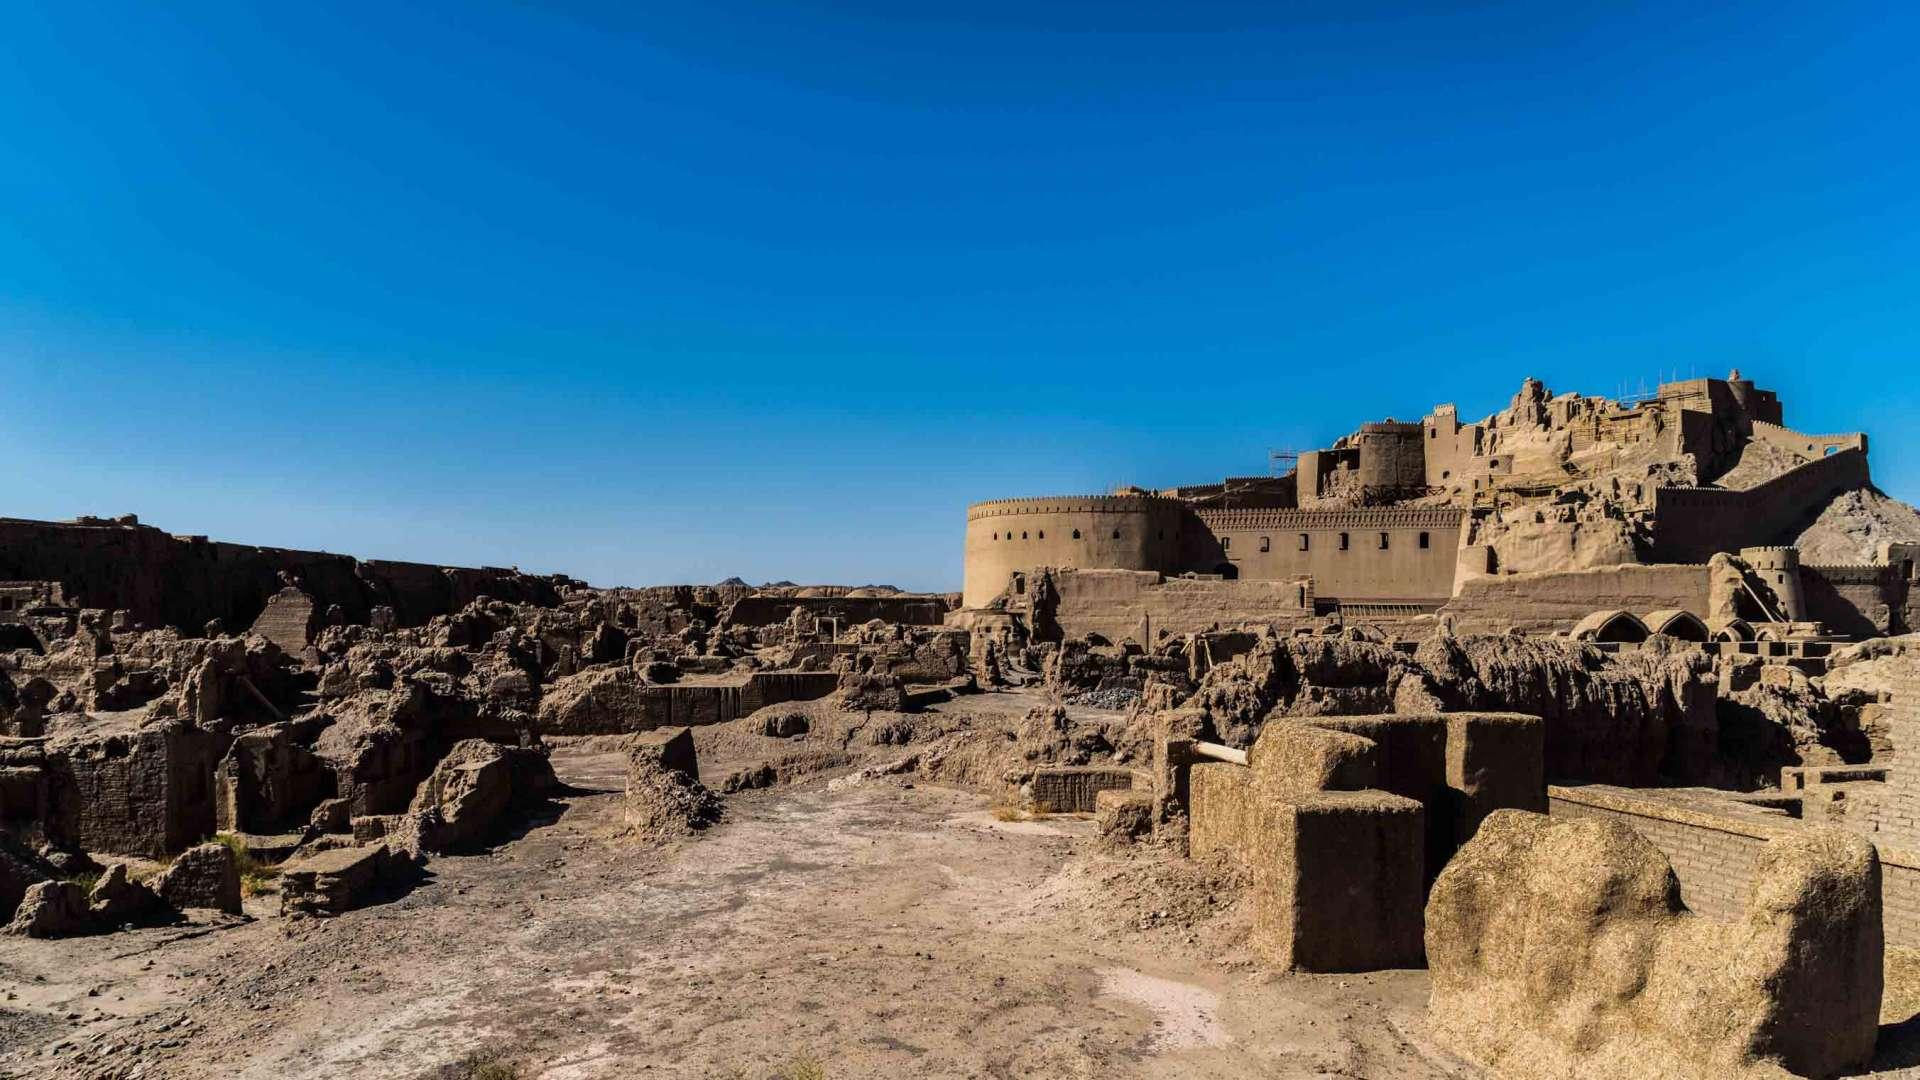 Bam citadel 2